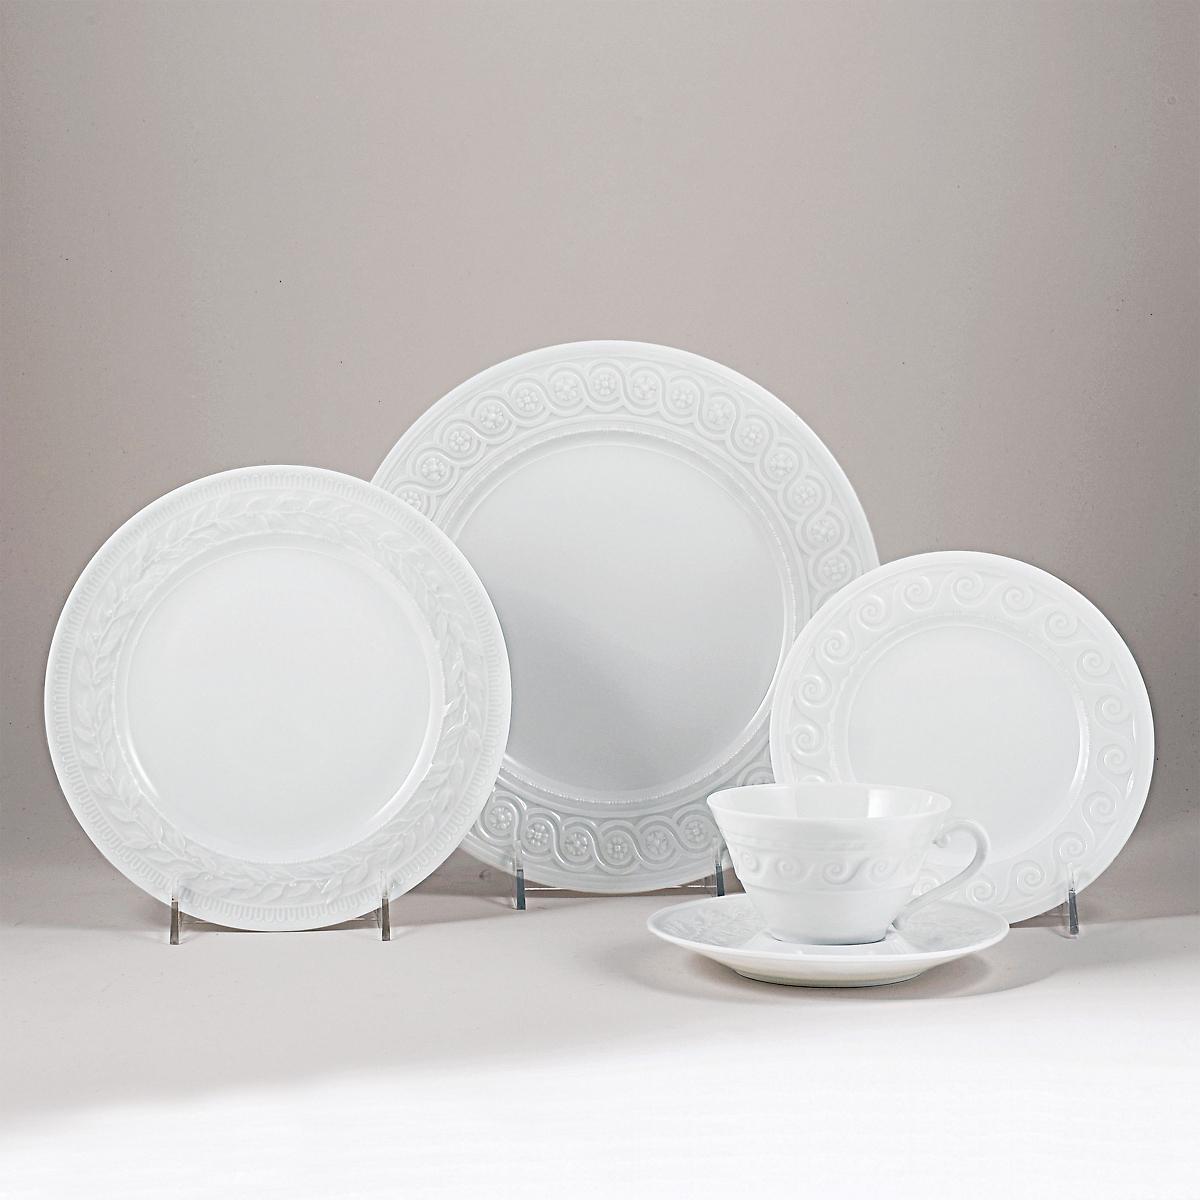 Bernardaud Louvre Dinnerware & Bernardaud Louvre Dinnerware   Gumpu0027s